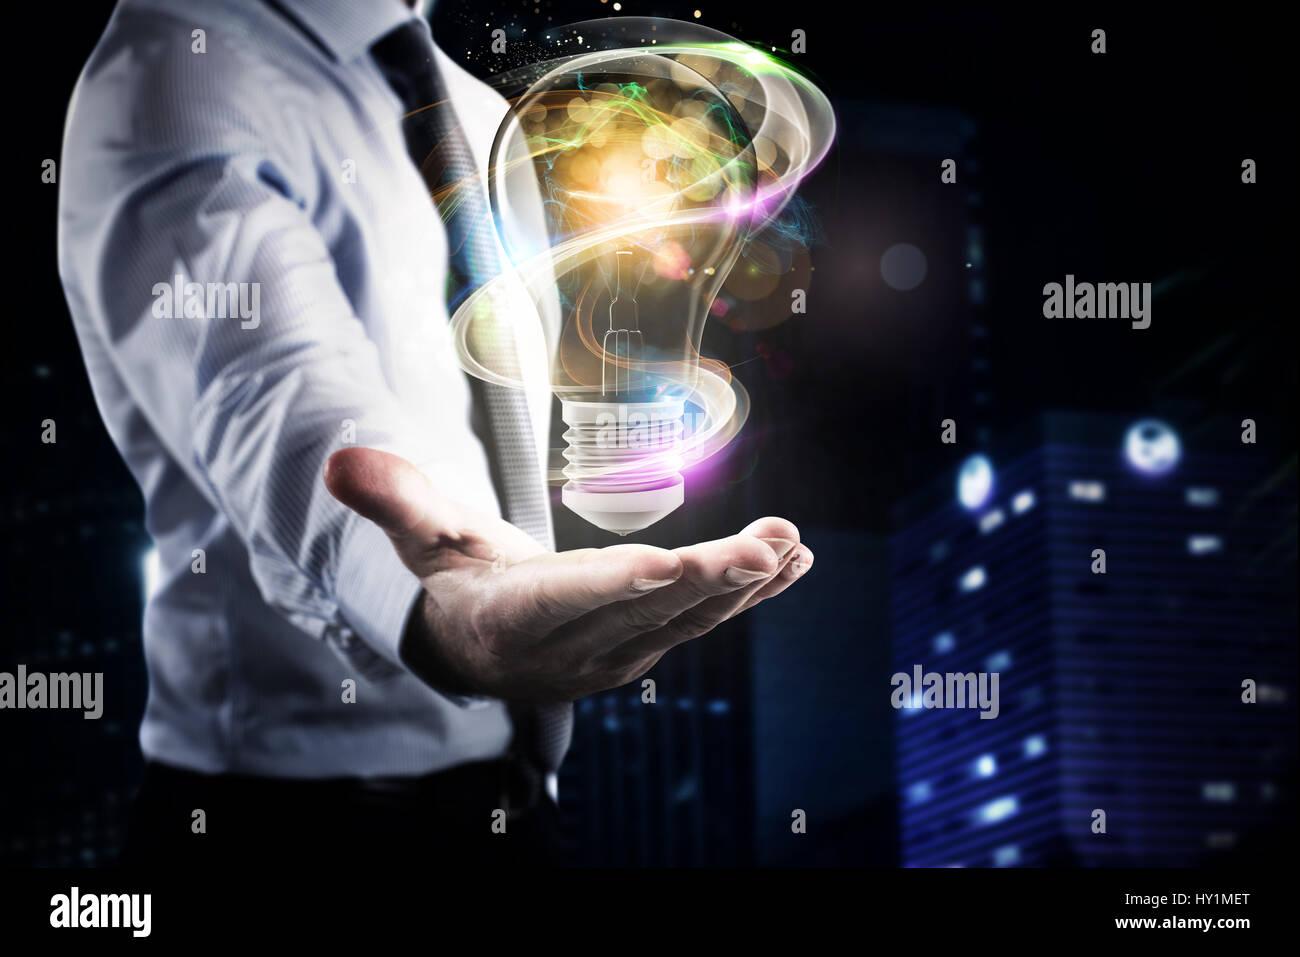 Idée lumineuse d'affaires Photo Stock